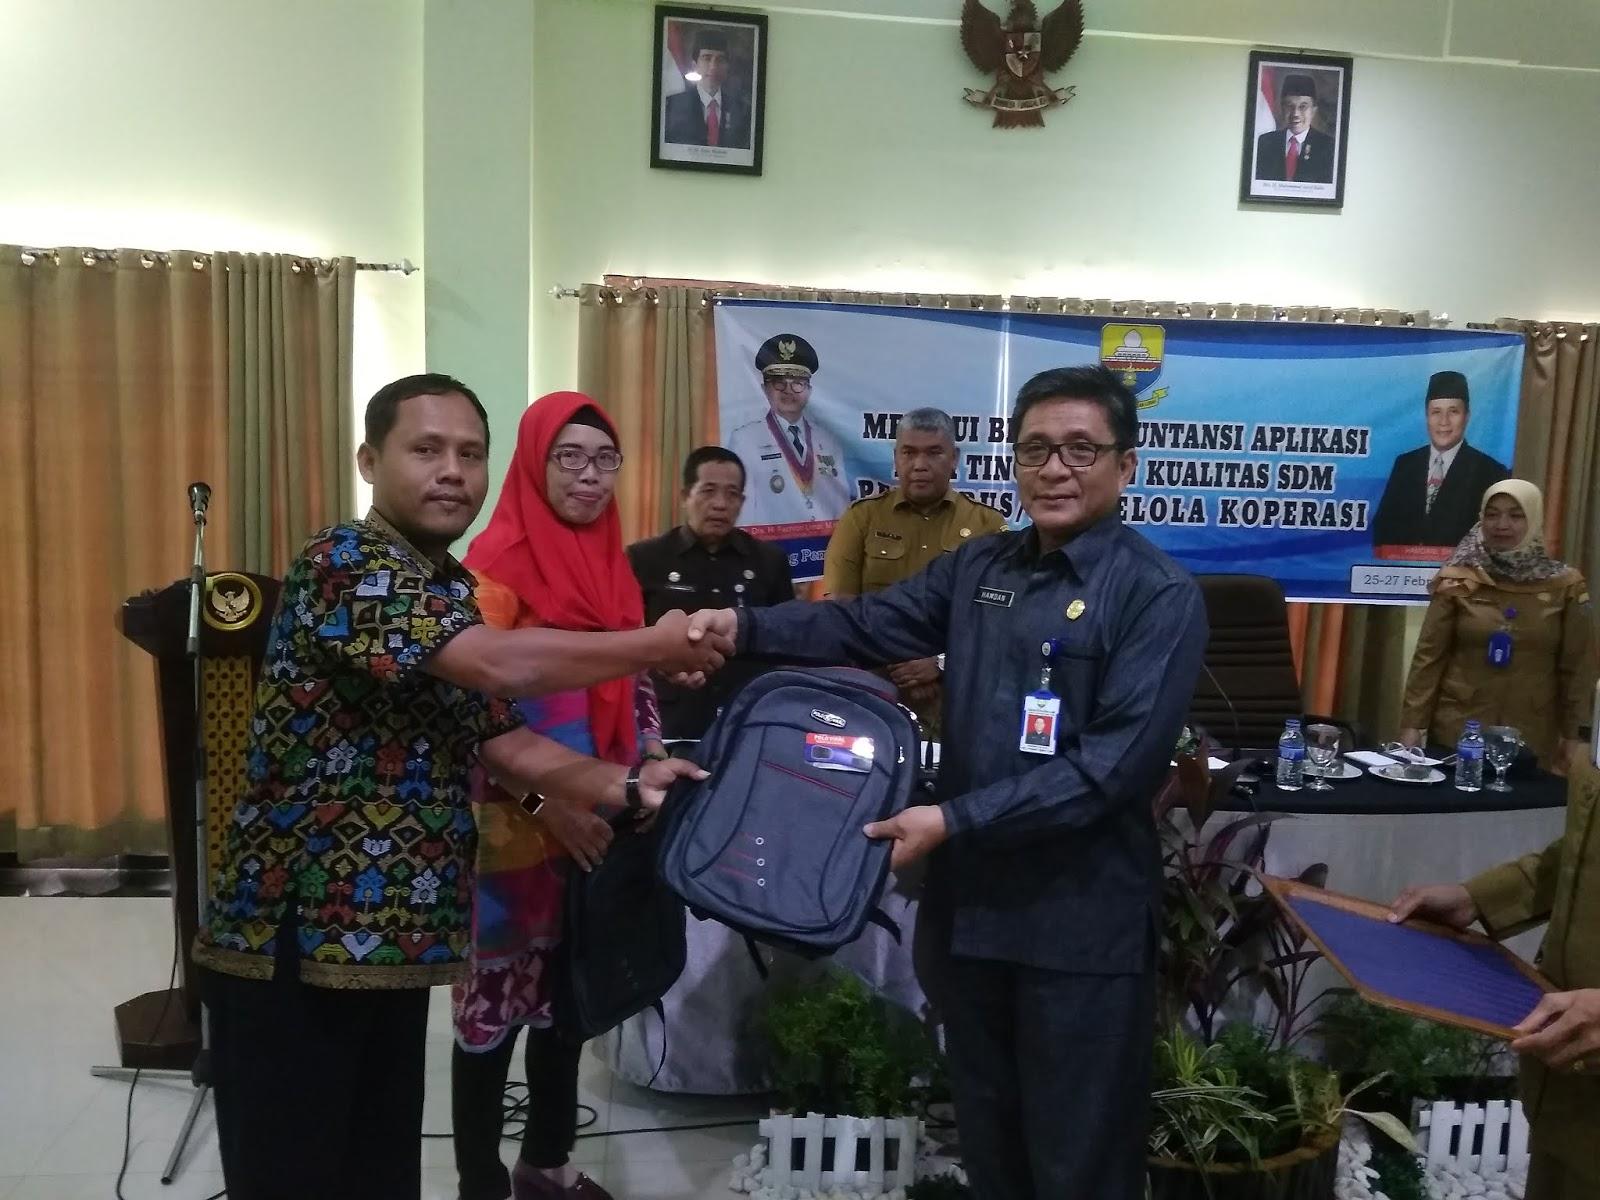 Kadis Koperasi dan UKM Provinsi Jambi Buka Bintek Akuntansi Aplikasi Meningkatkan Kualitas SDM Pengurus Pengelola koperasi.